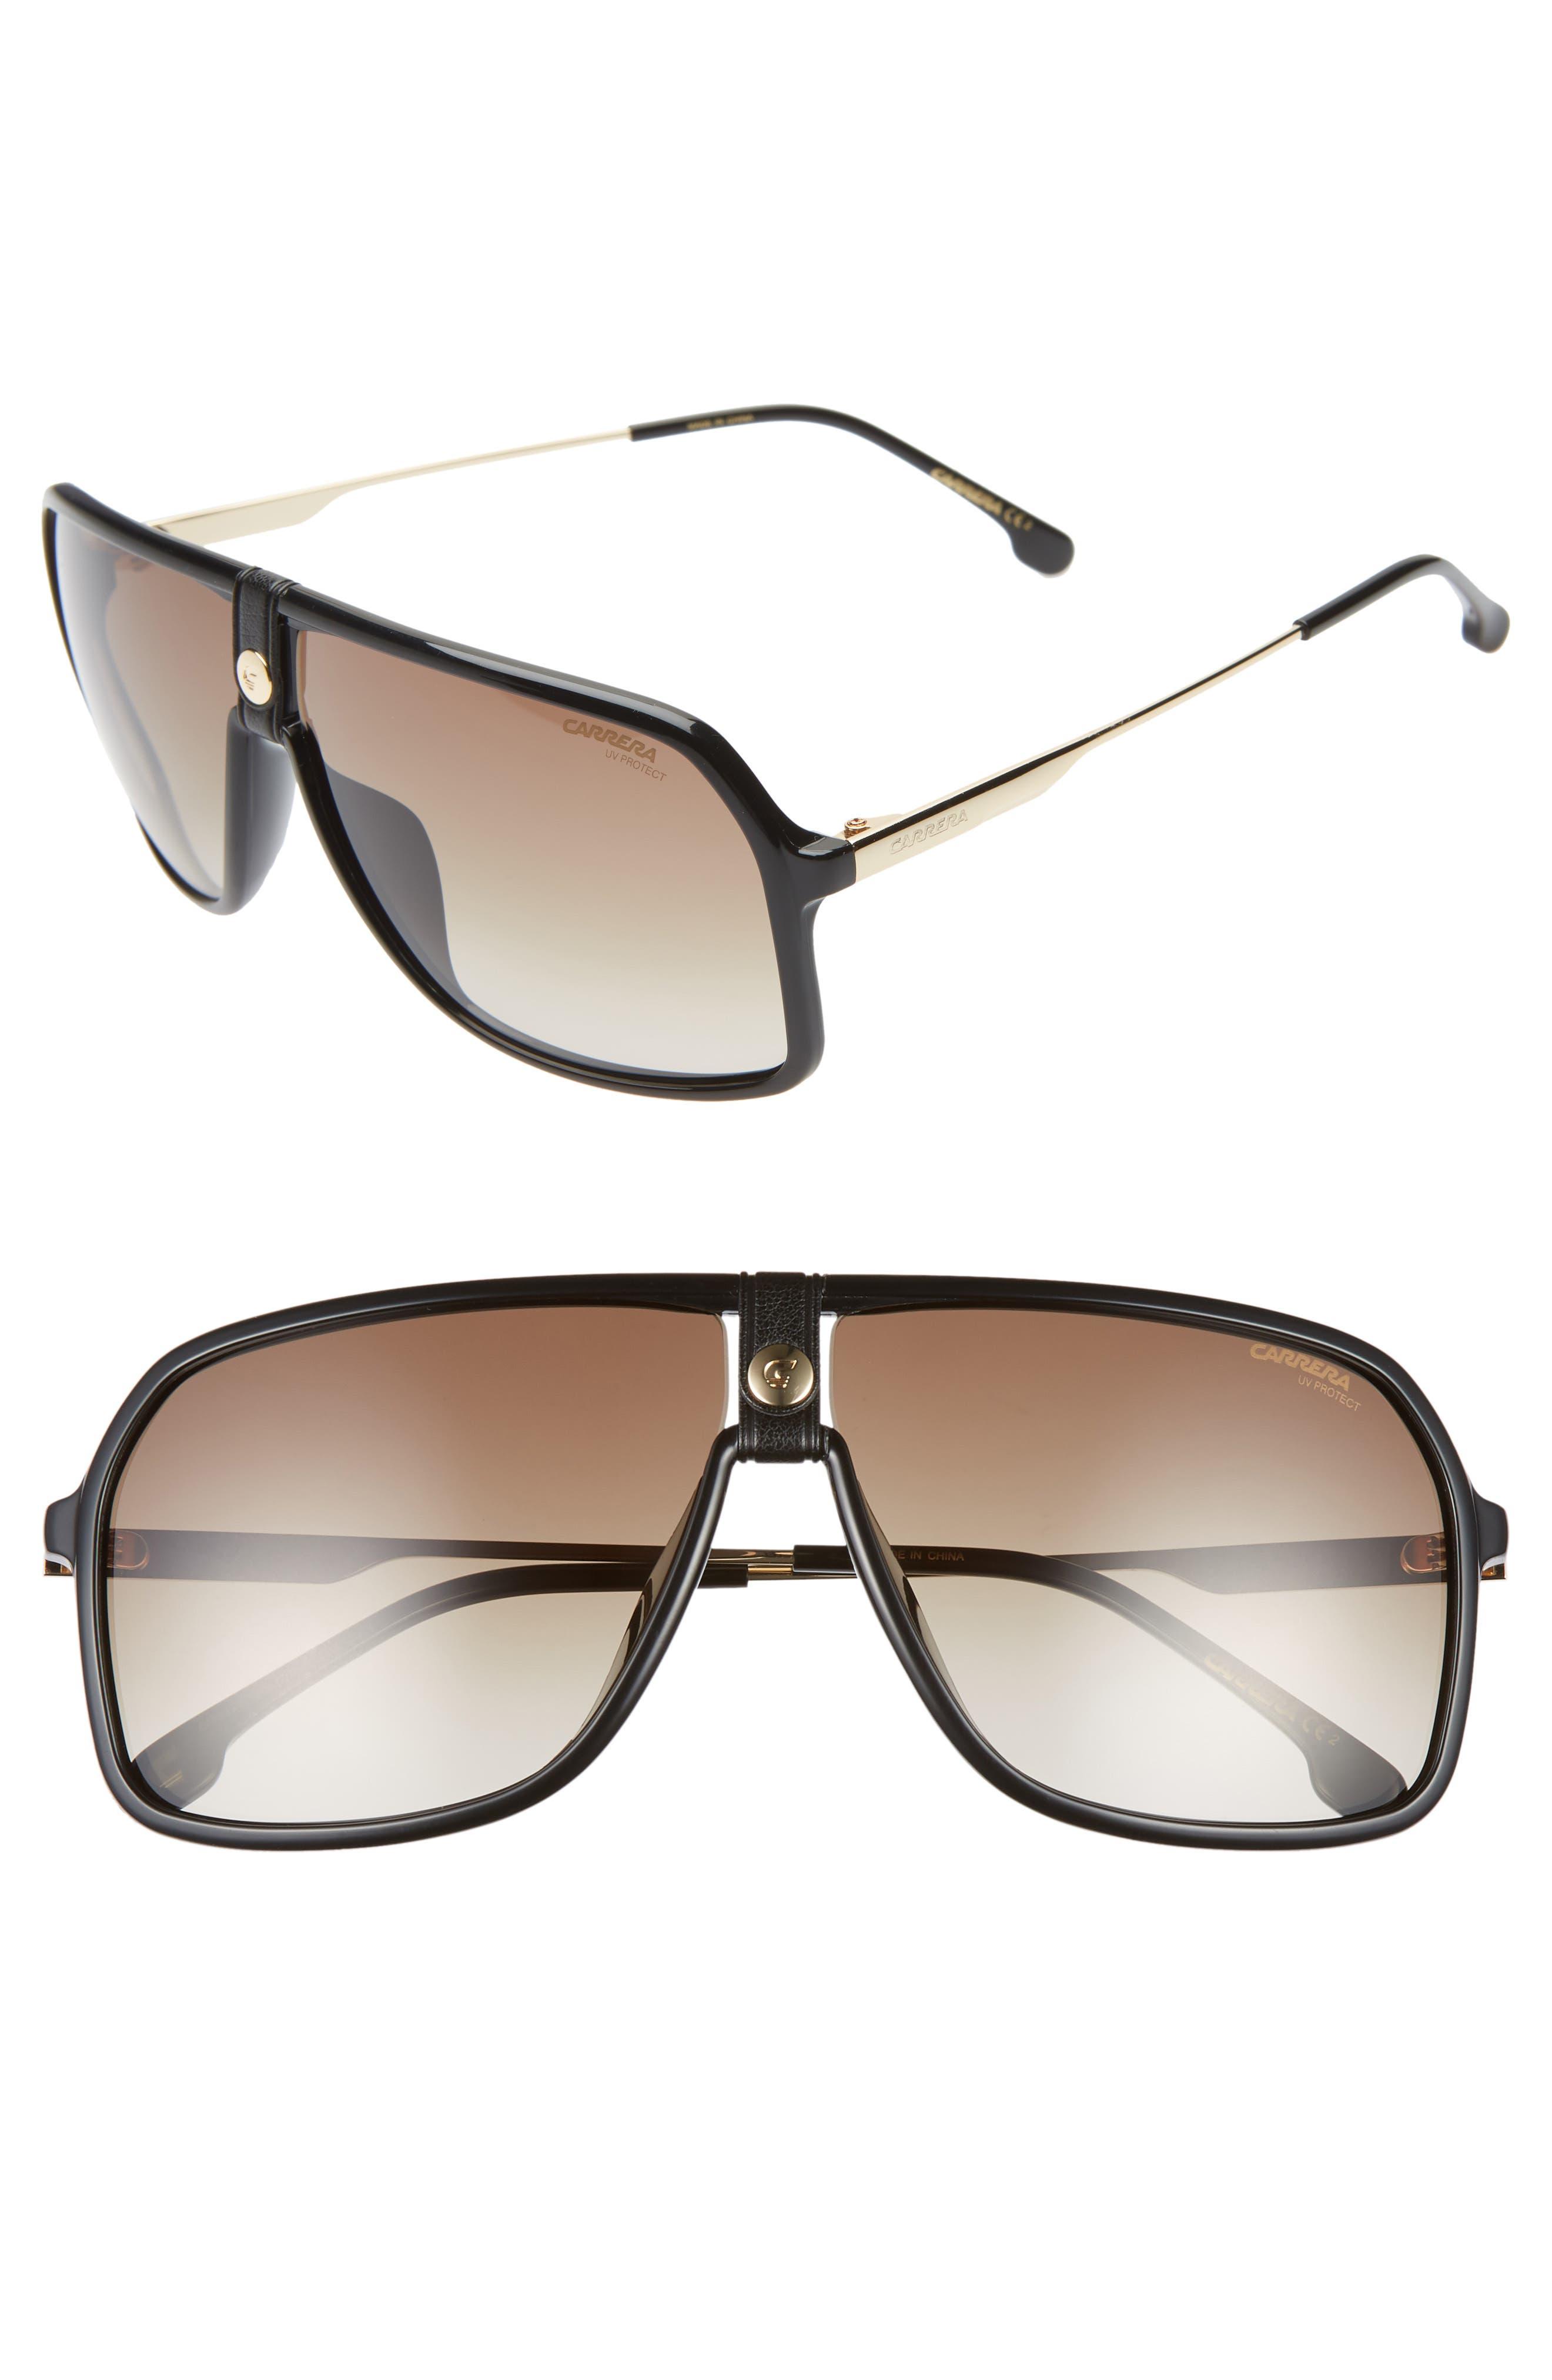 Carrera Eyewear Navigator Sunglasses - Black